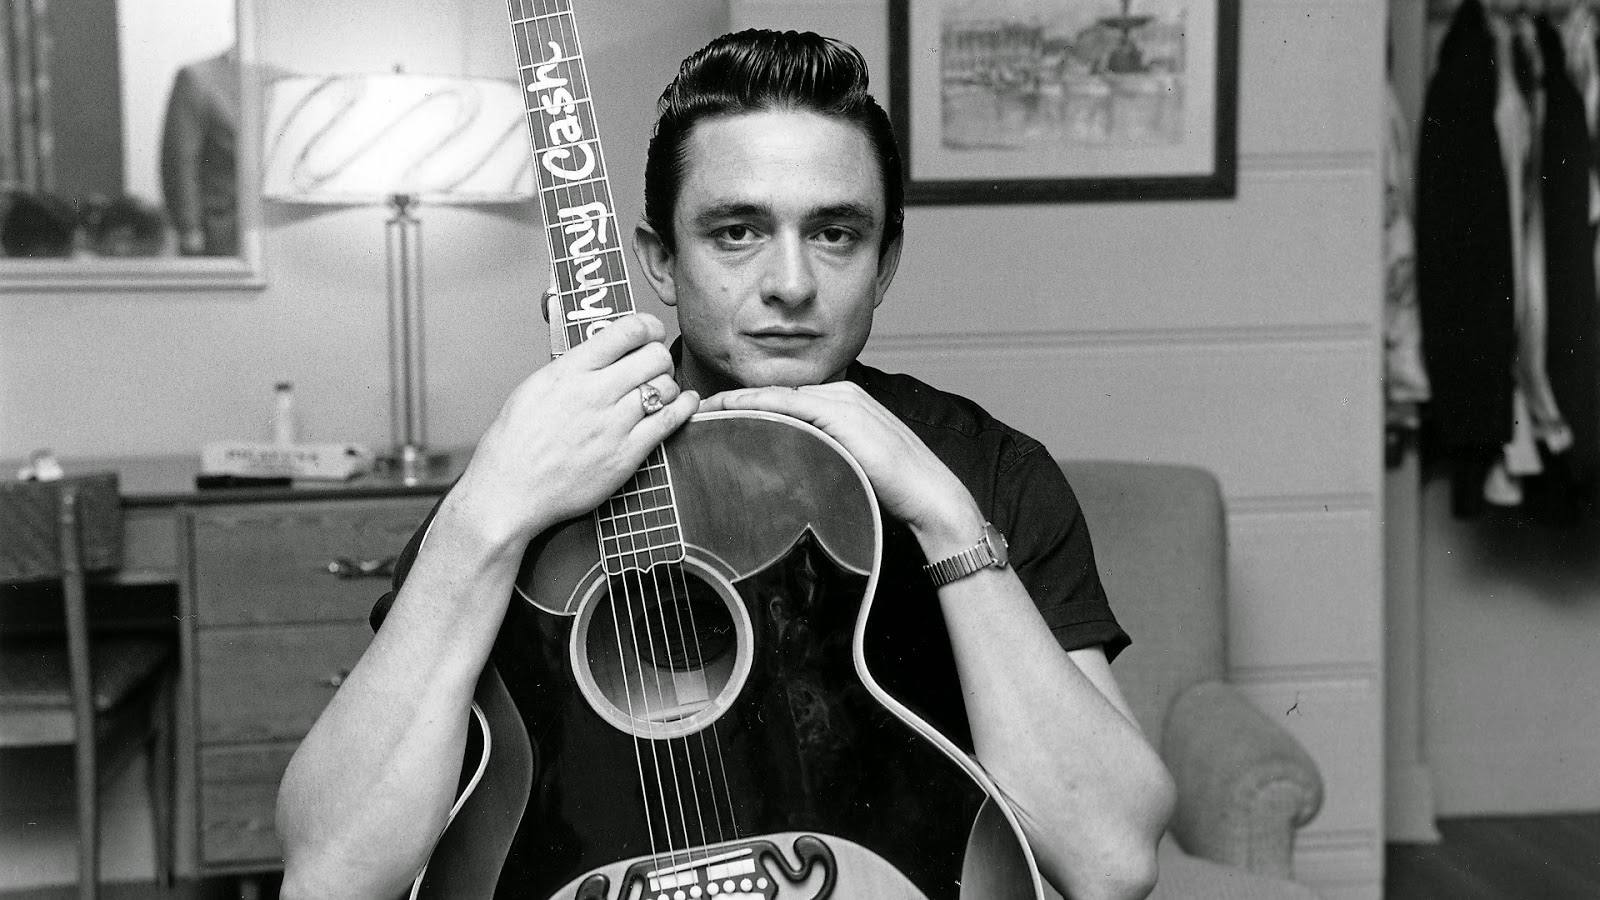 Solitary man Johnny Cash traduzione testo lyrics Stargate Atlantis video